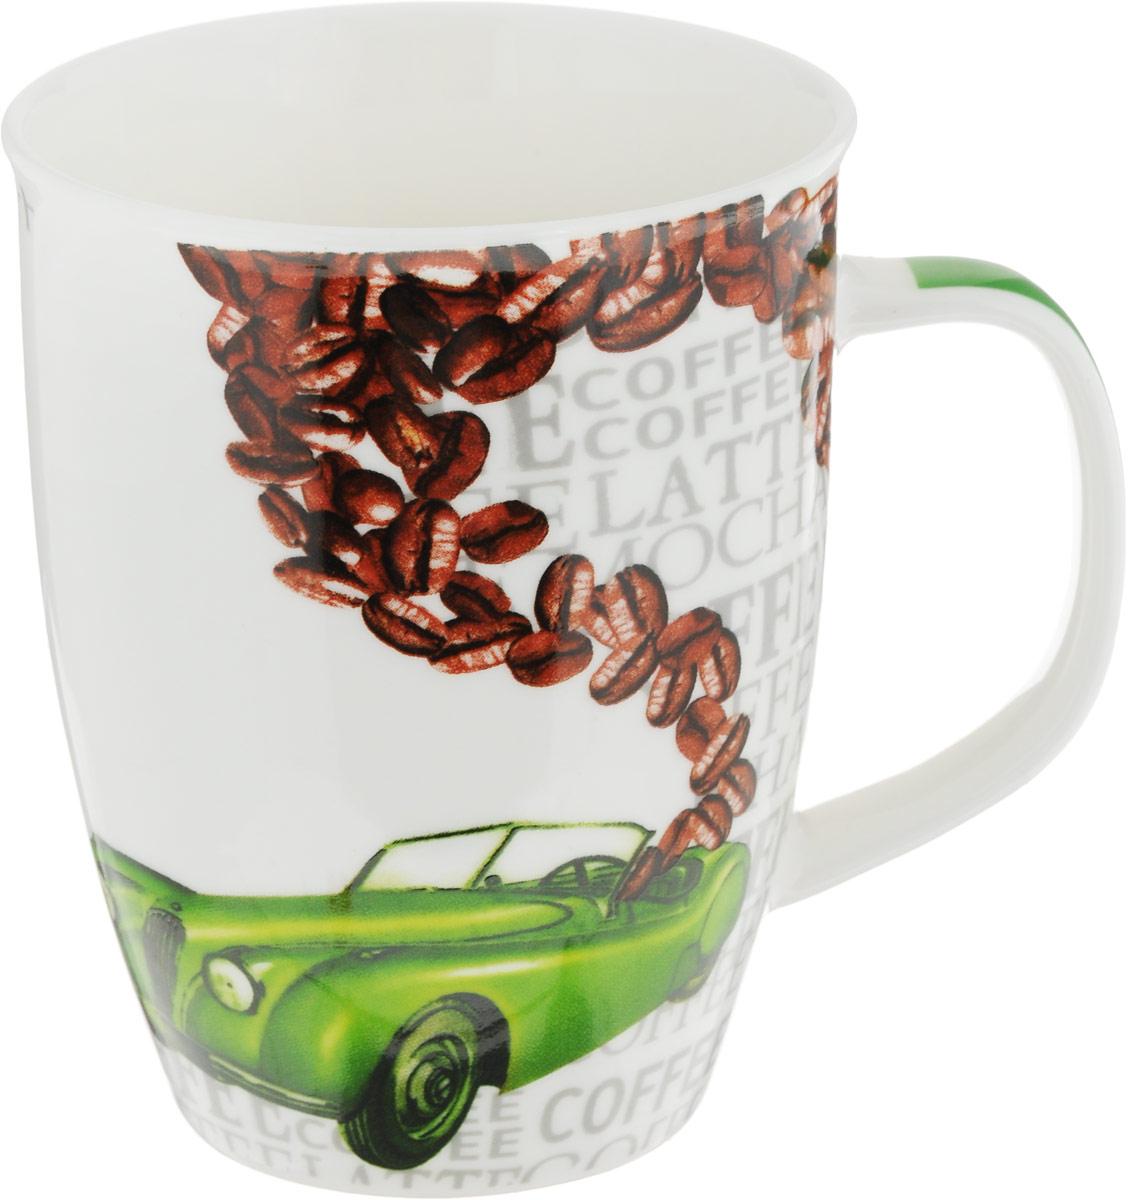 Кружка Loraine Автомобиль, цвет: зеленый, 340 мл кружка loraine автомобиль цвет желтый коричневый 340 мл